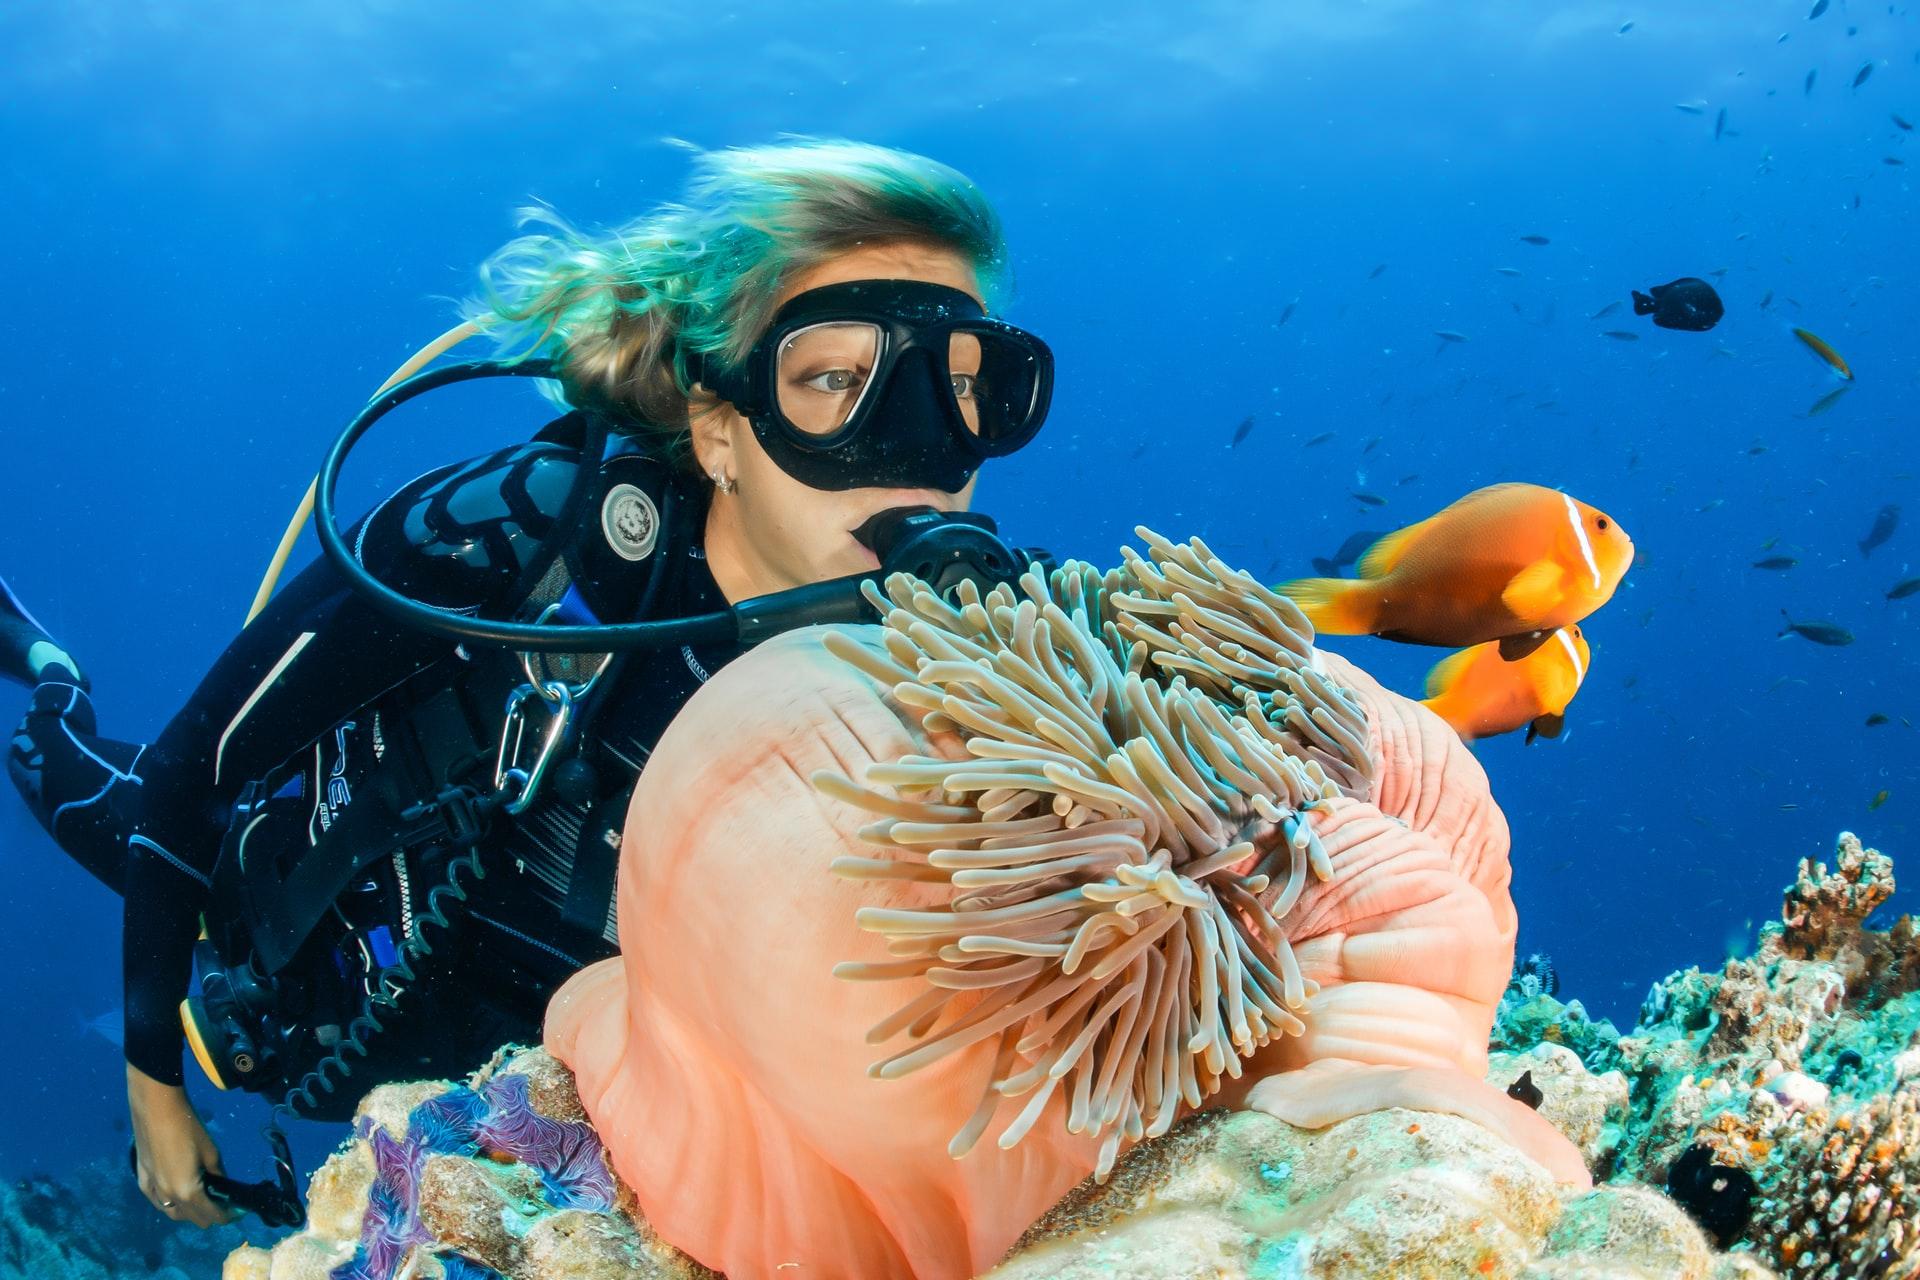 A female scuba diver in Koh Tao, Thailand